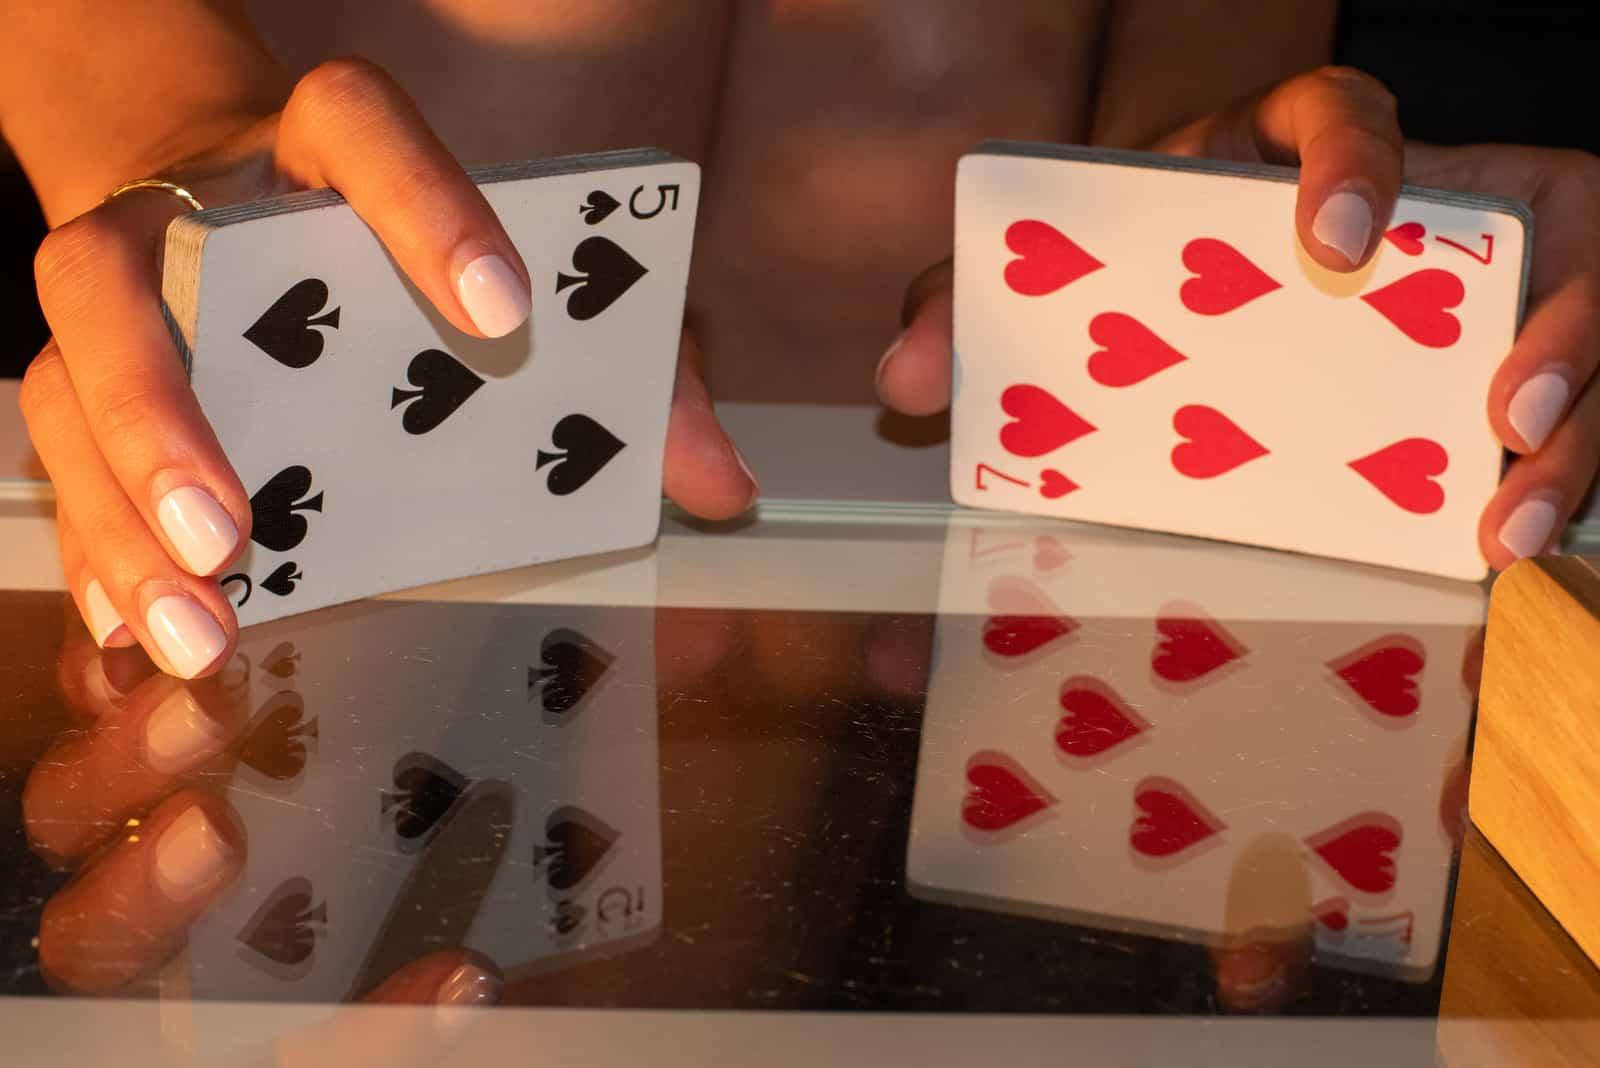 la femme tient les cartes dans sa main